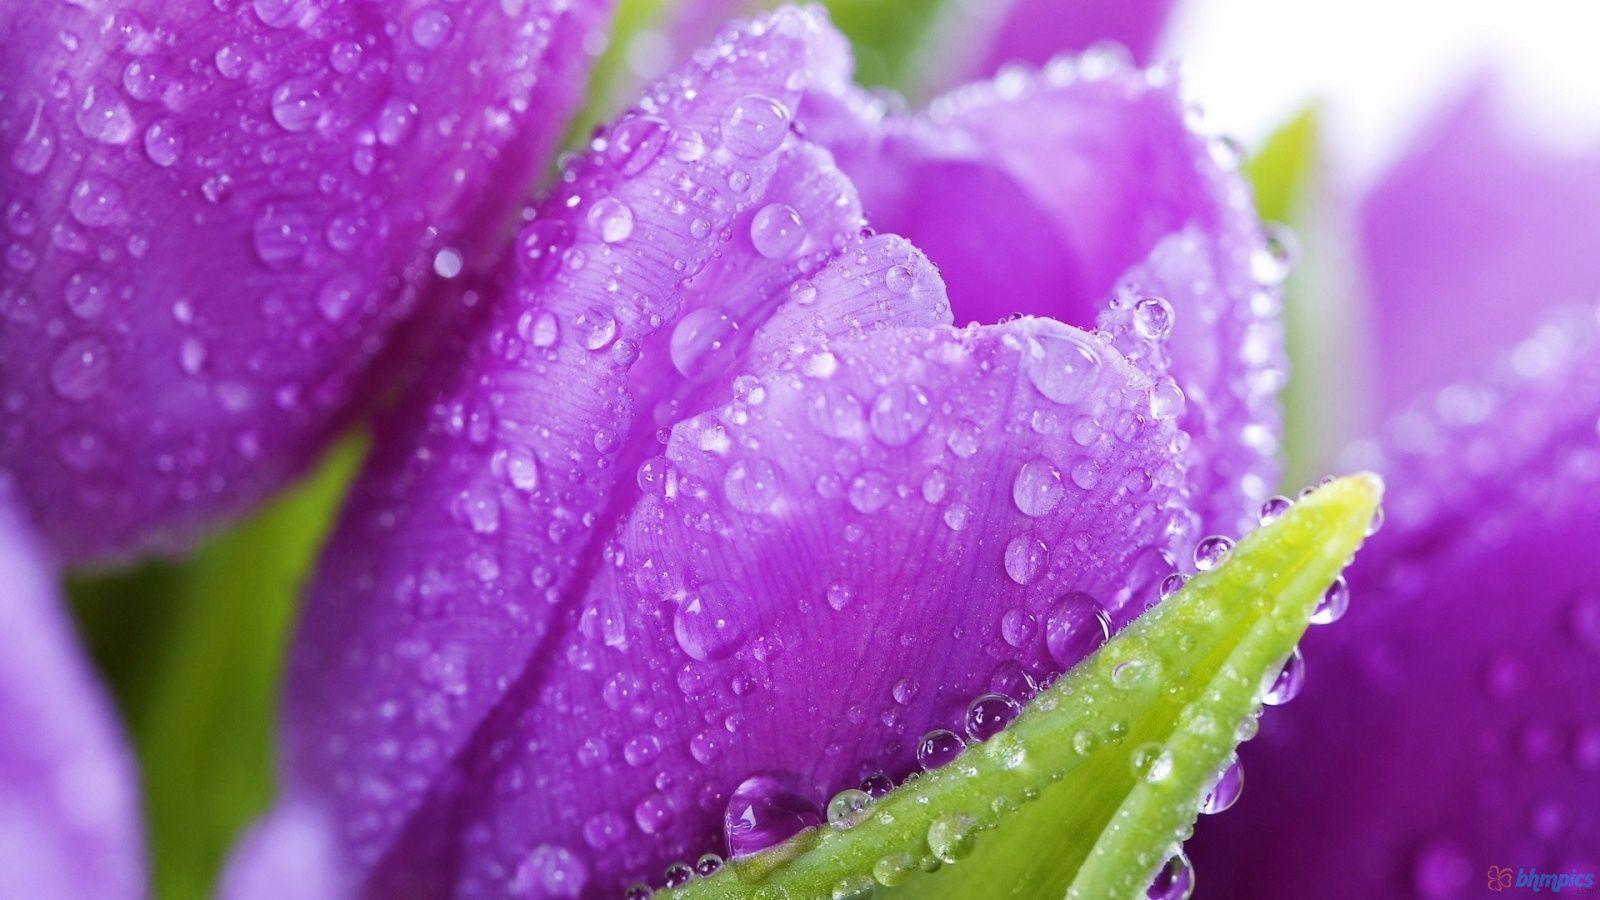 Purple Tulips 1600x900 2640 Hd Wallpaper Res 1600x900 Purple Flowers Wallpaper Tulips Flowers Purple Tulips